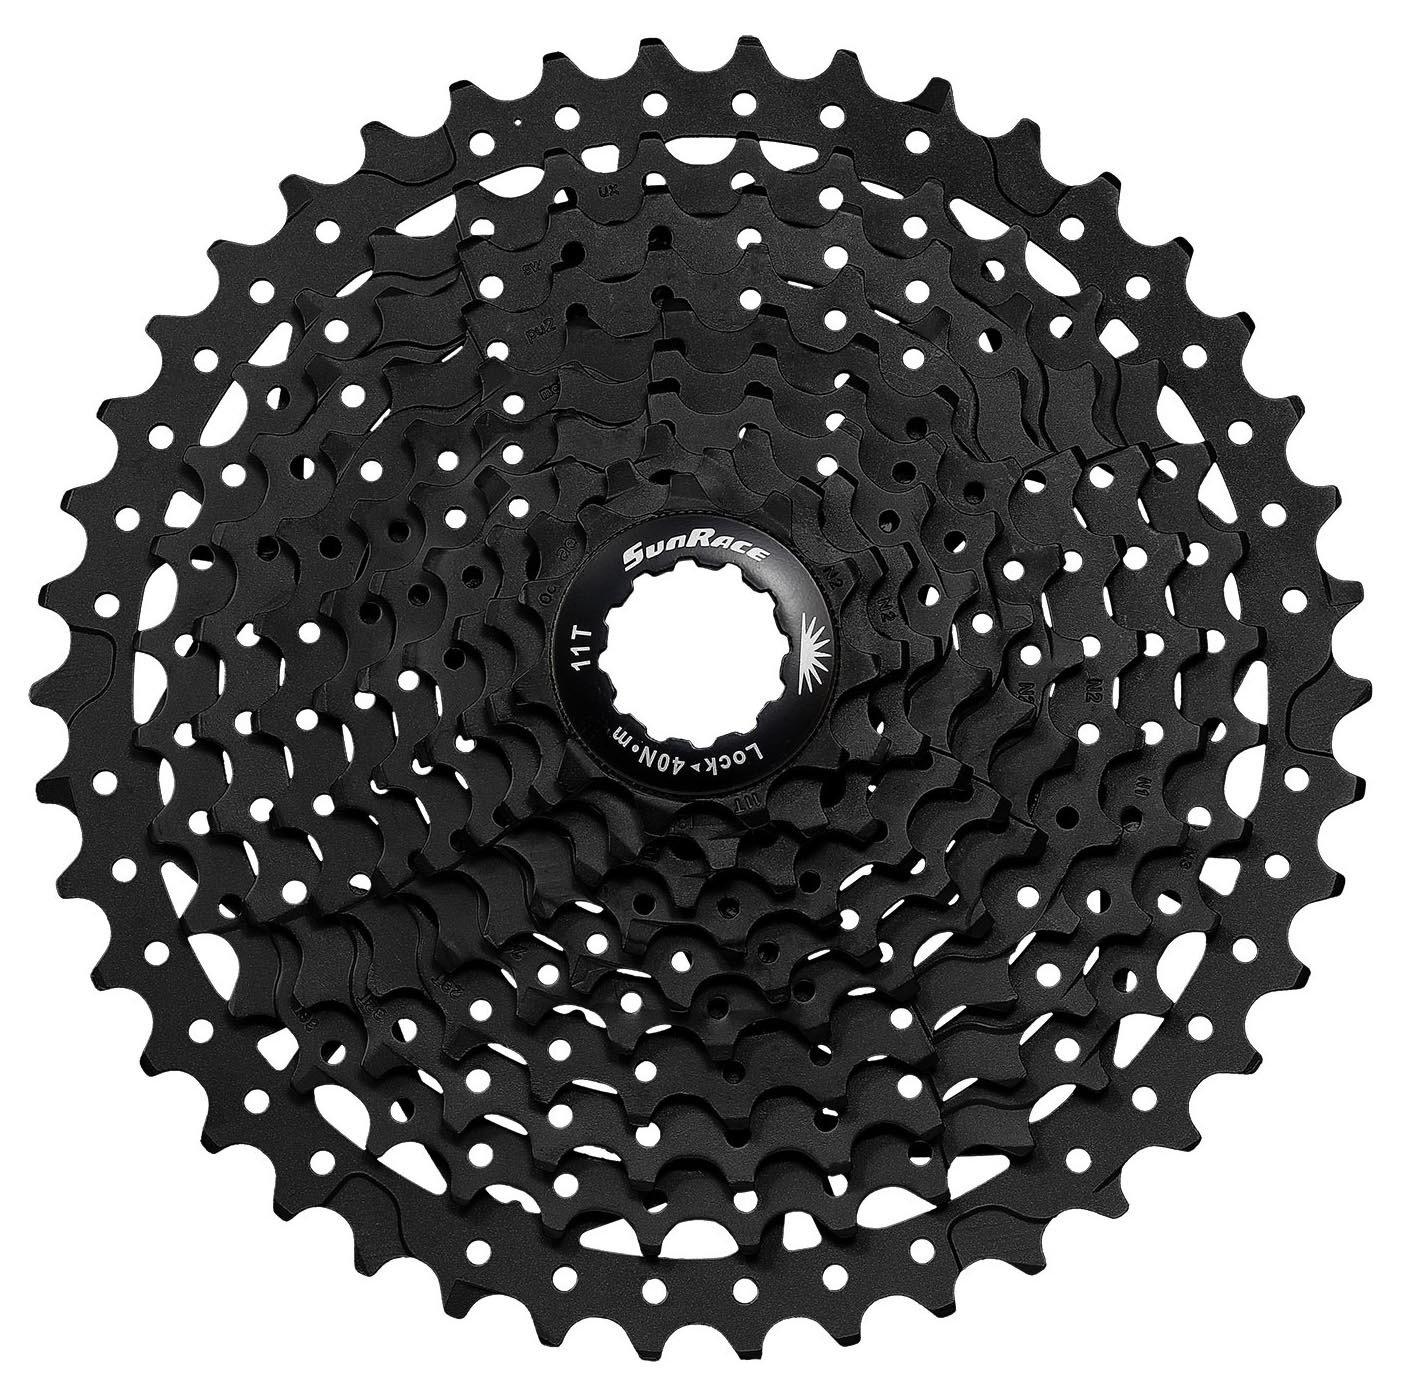 Sunrace ms3 10スピードマウンテン自転車自転車カセットブラック B07B4MFCJTBlack 11-46 Teeth